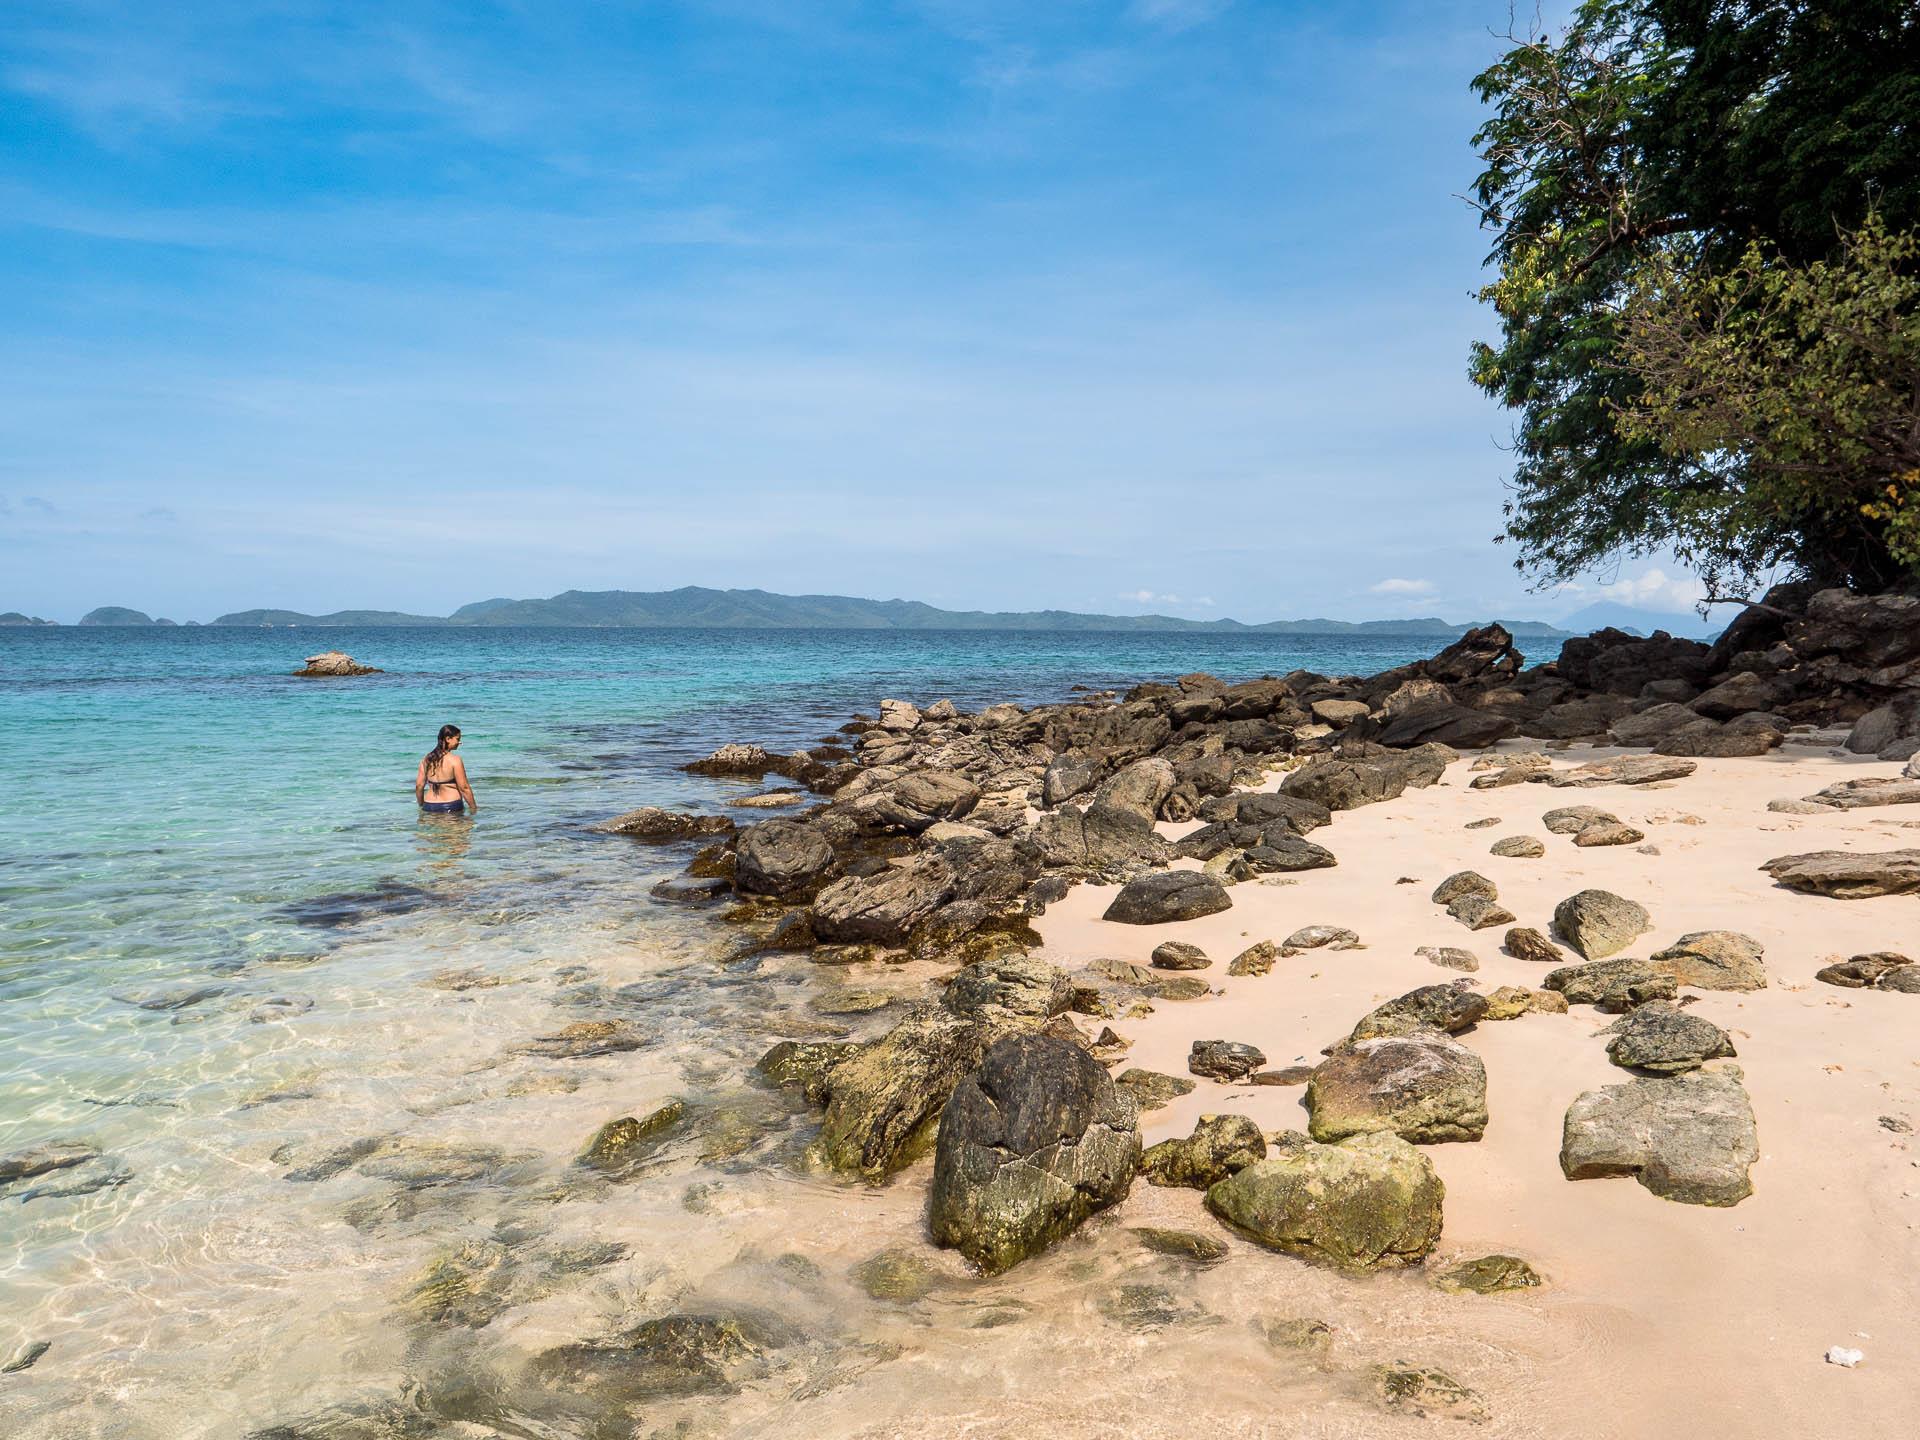 Port barton plage bis - Les globe blogueurs - blog voyage nature